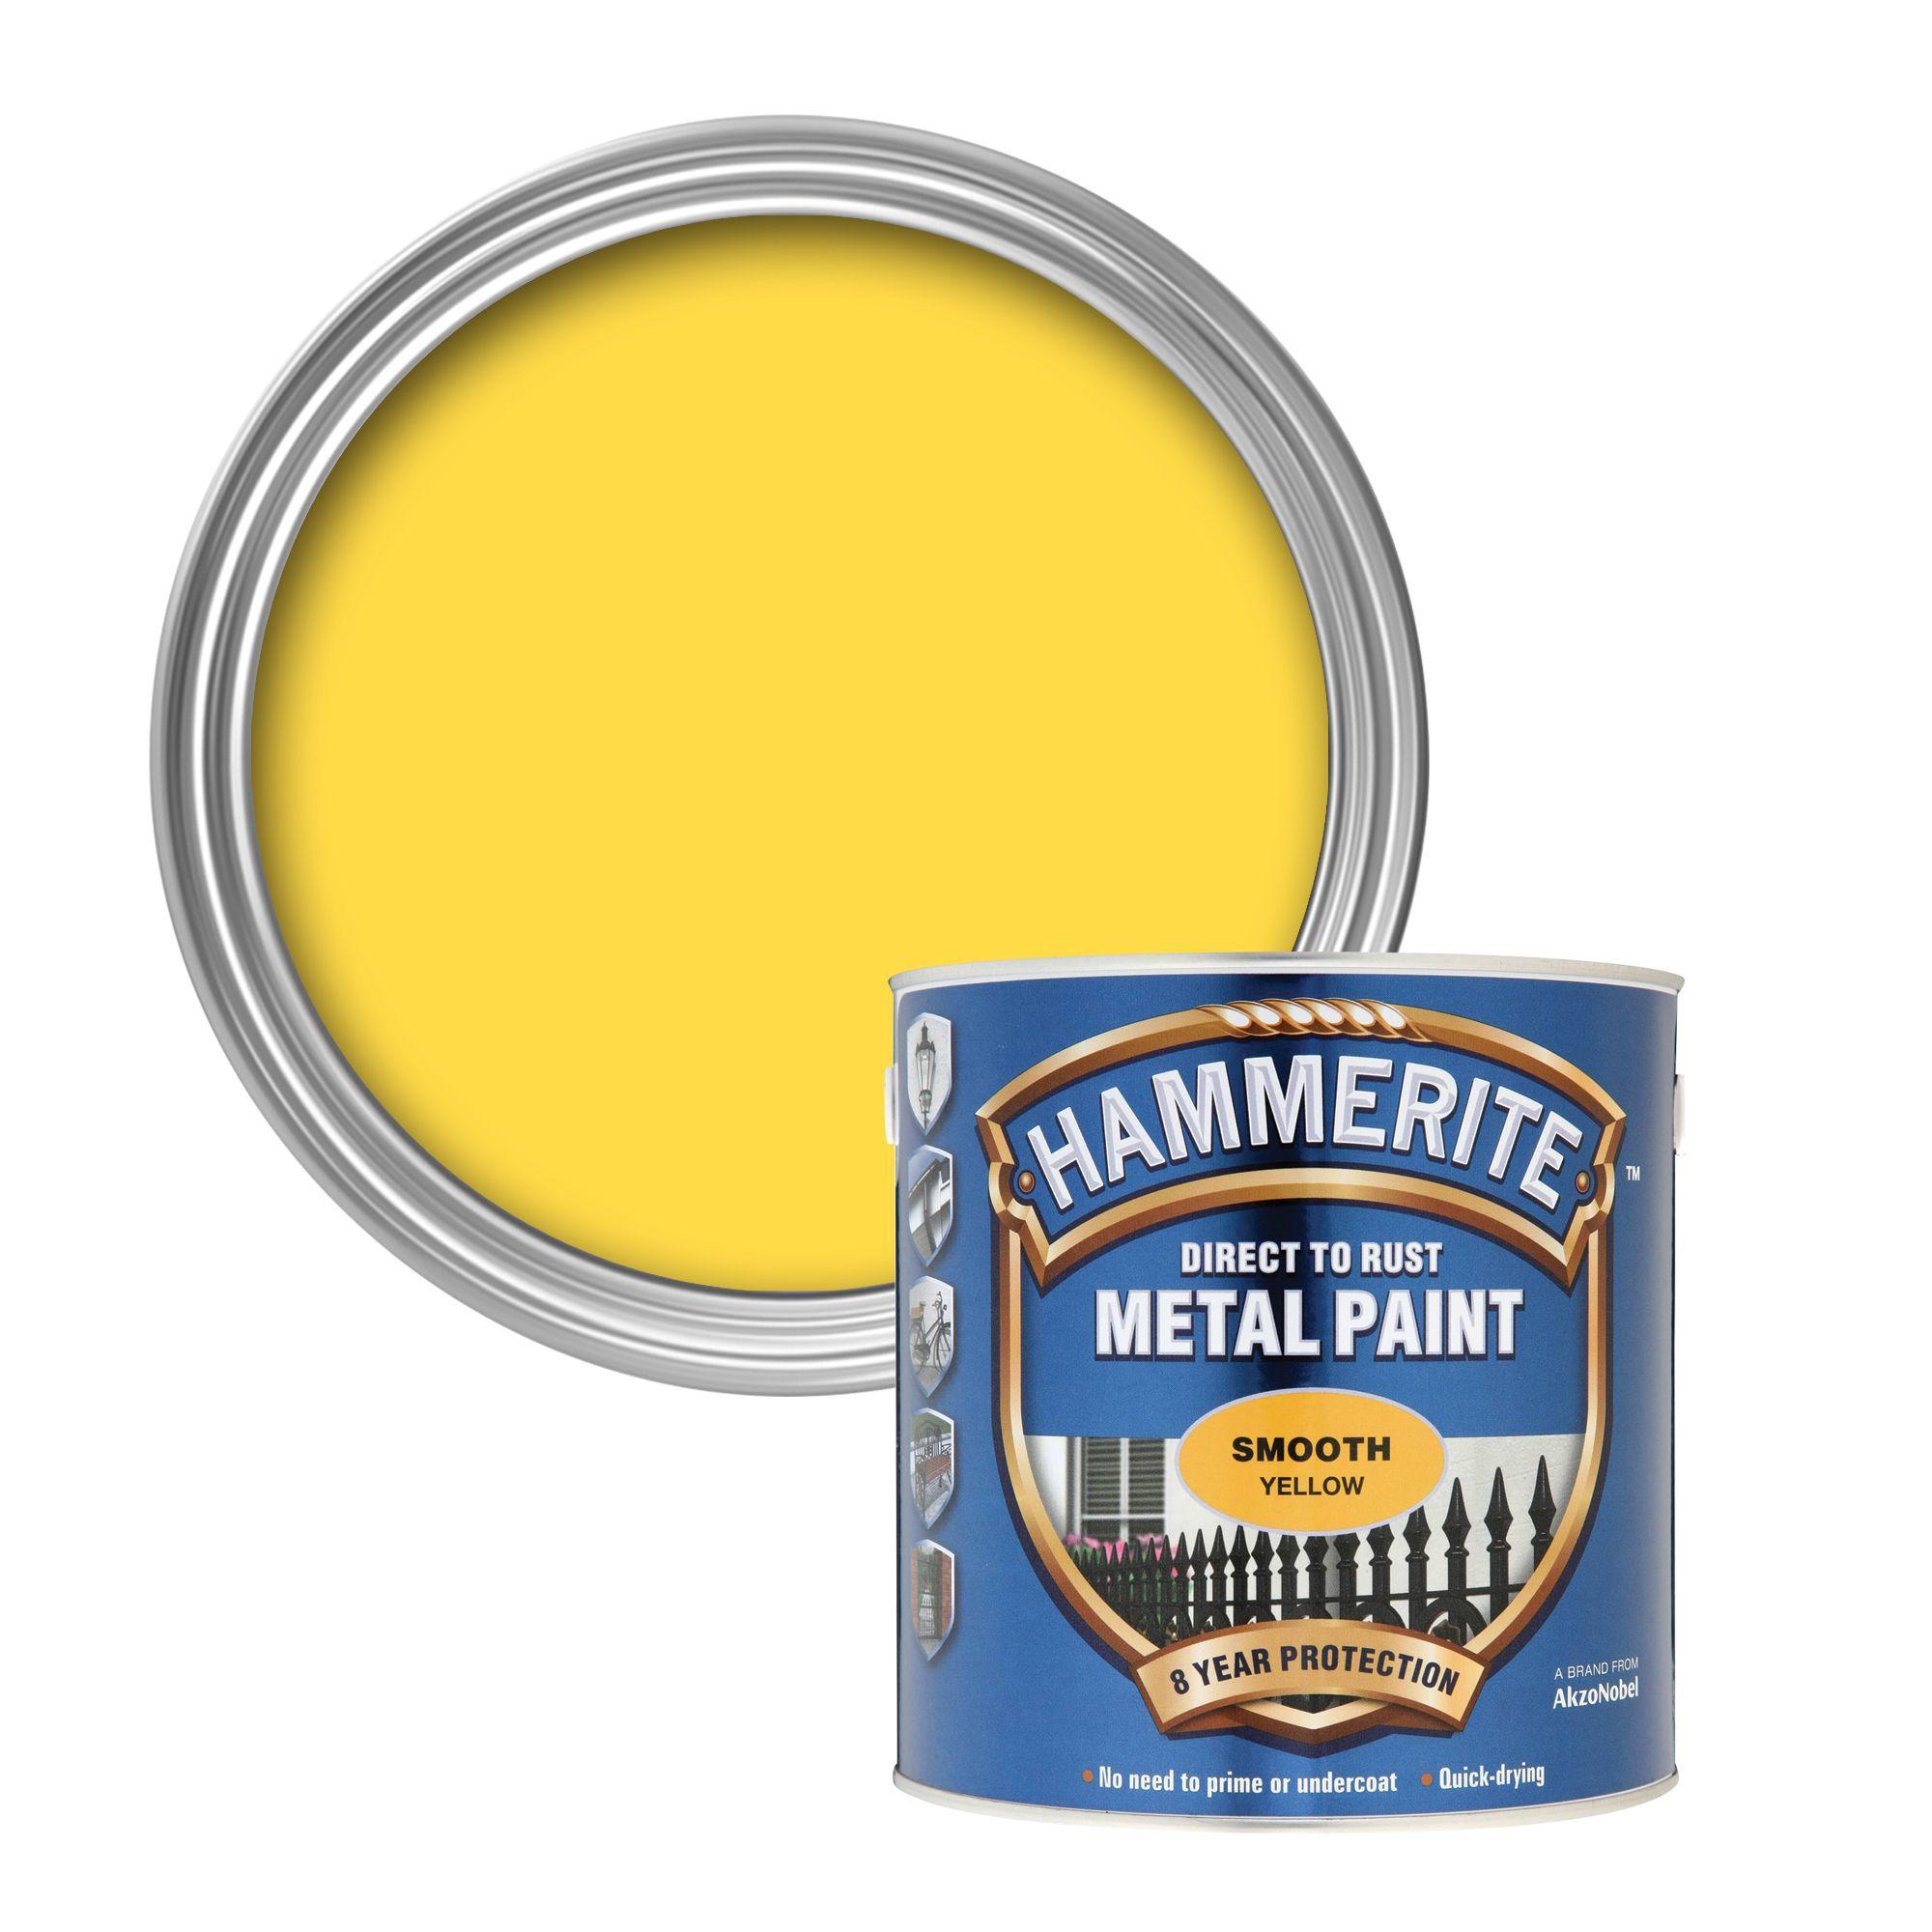 Metal Gate Rust Paint Direct